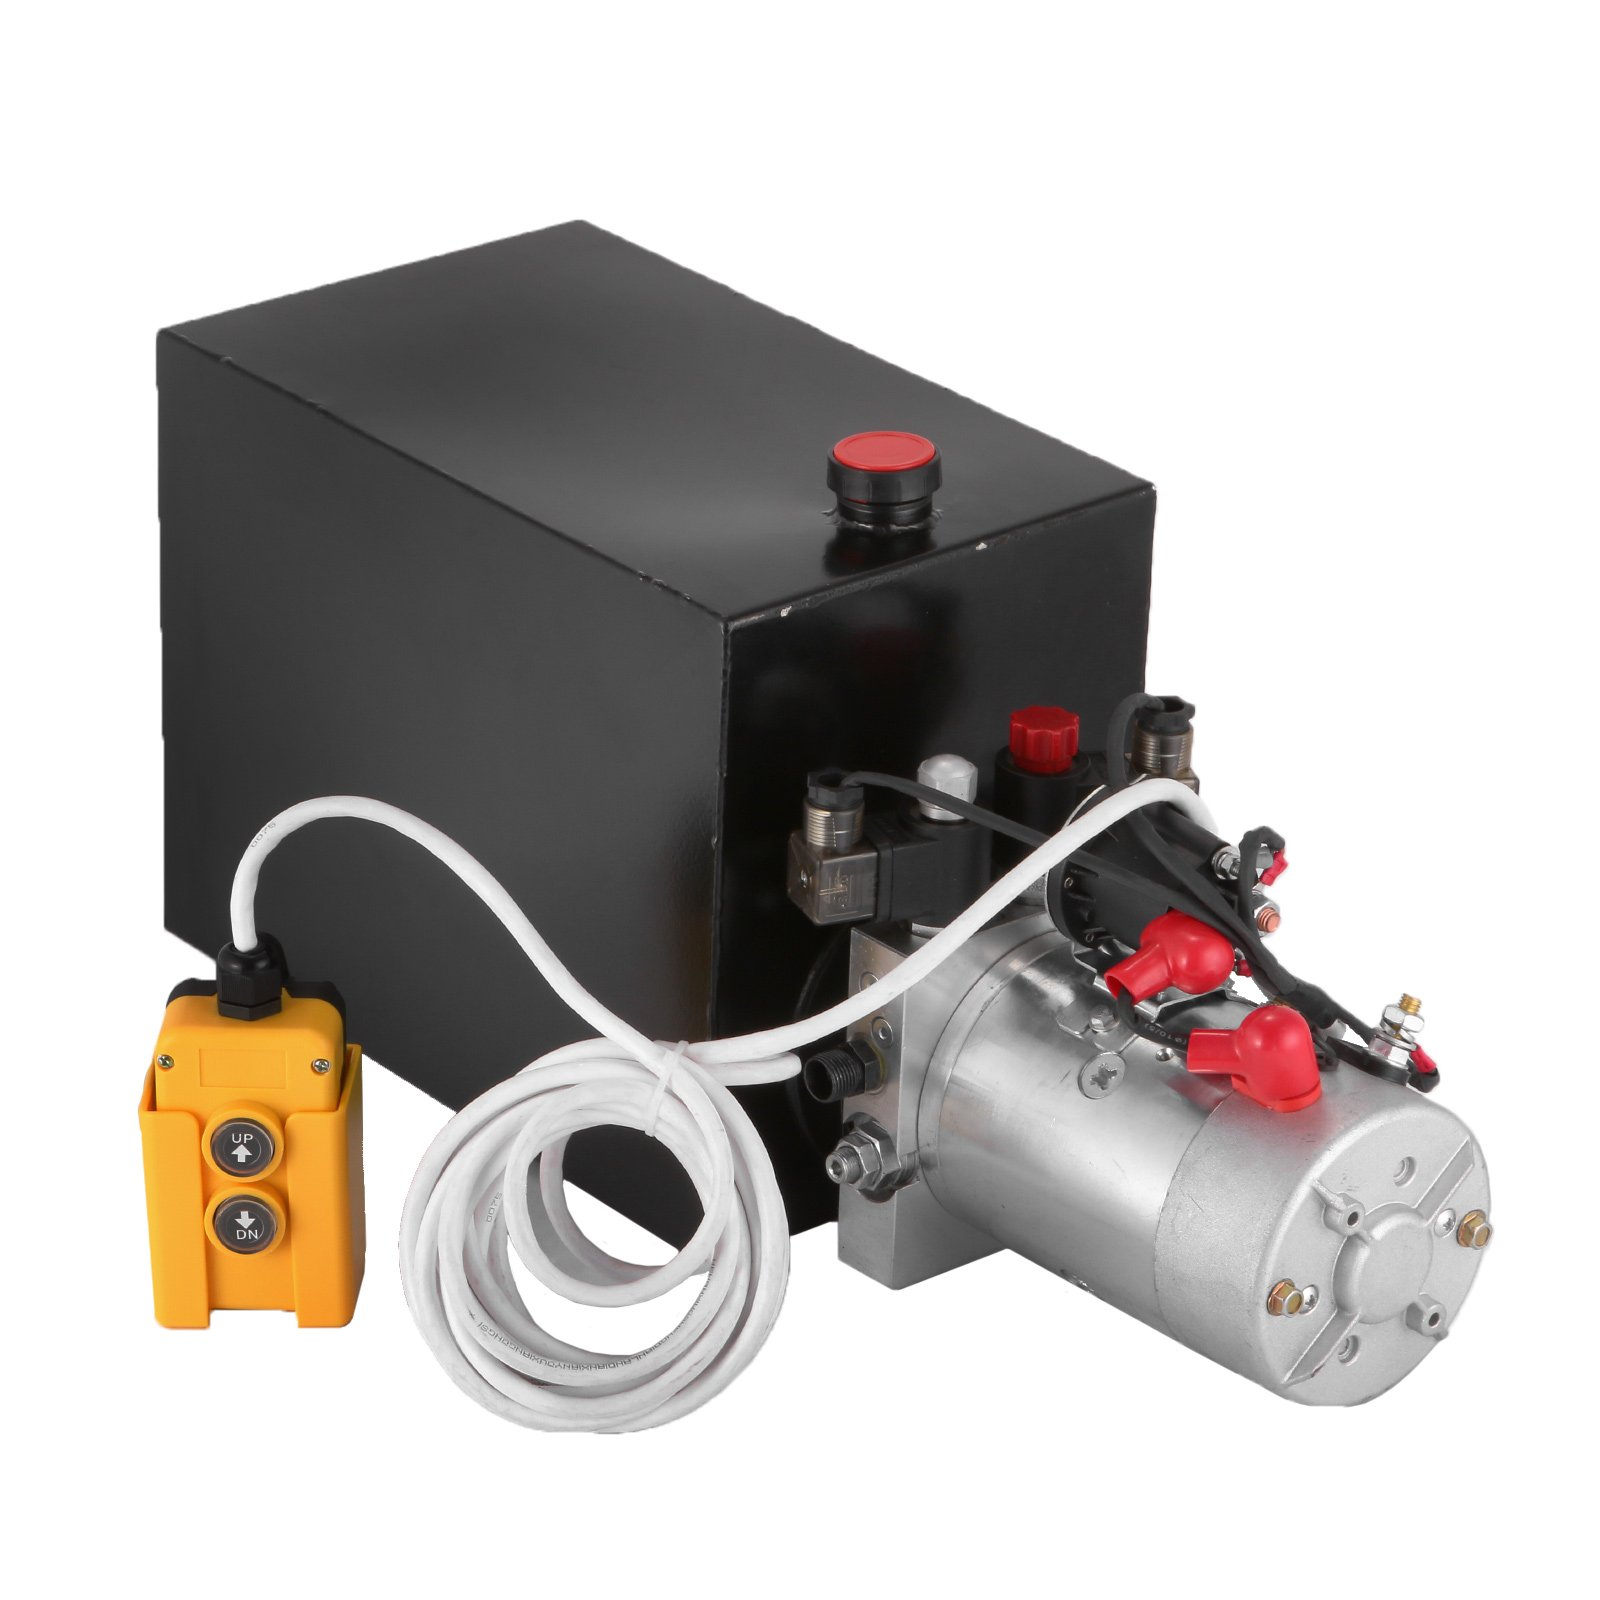 Mophorn 12V/DC Hydraulic Pump Double Acting 15 Quart Metal Reservoir Hydraulic Pump Unit W/ Remotely Controlled Hydraulic Power Unit for Dump Trailer